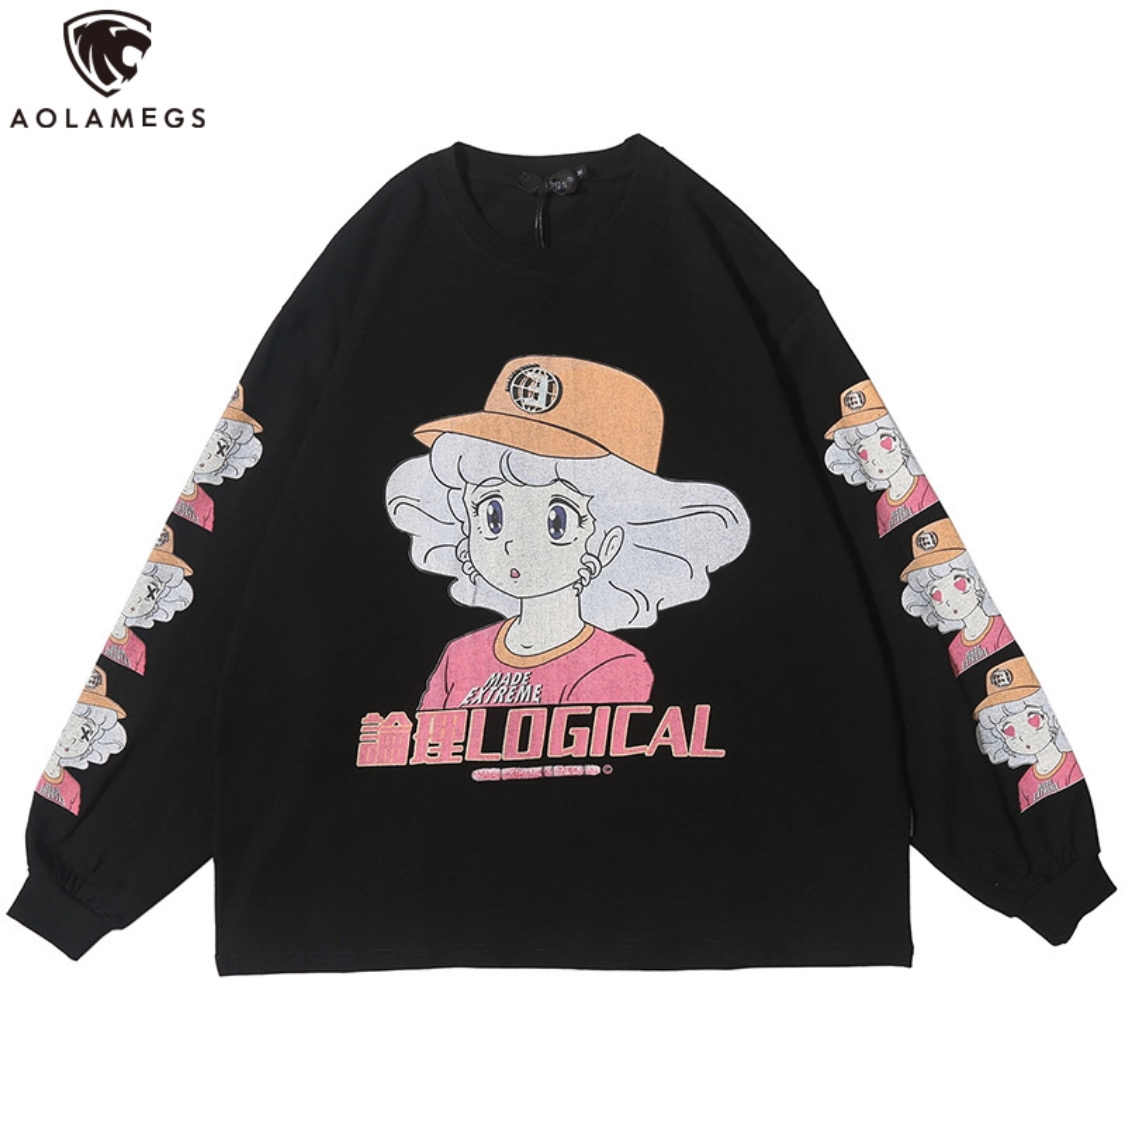 Aolamegs Sweatshirt Cartoon Comics Print Pullover Cozy 3 Color Optional All-match Hip Hop College Style Streetwear Couple Autumn